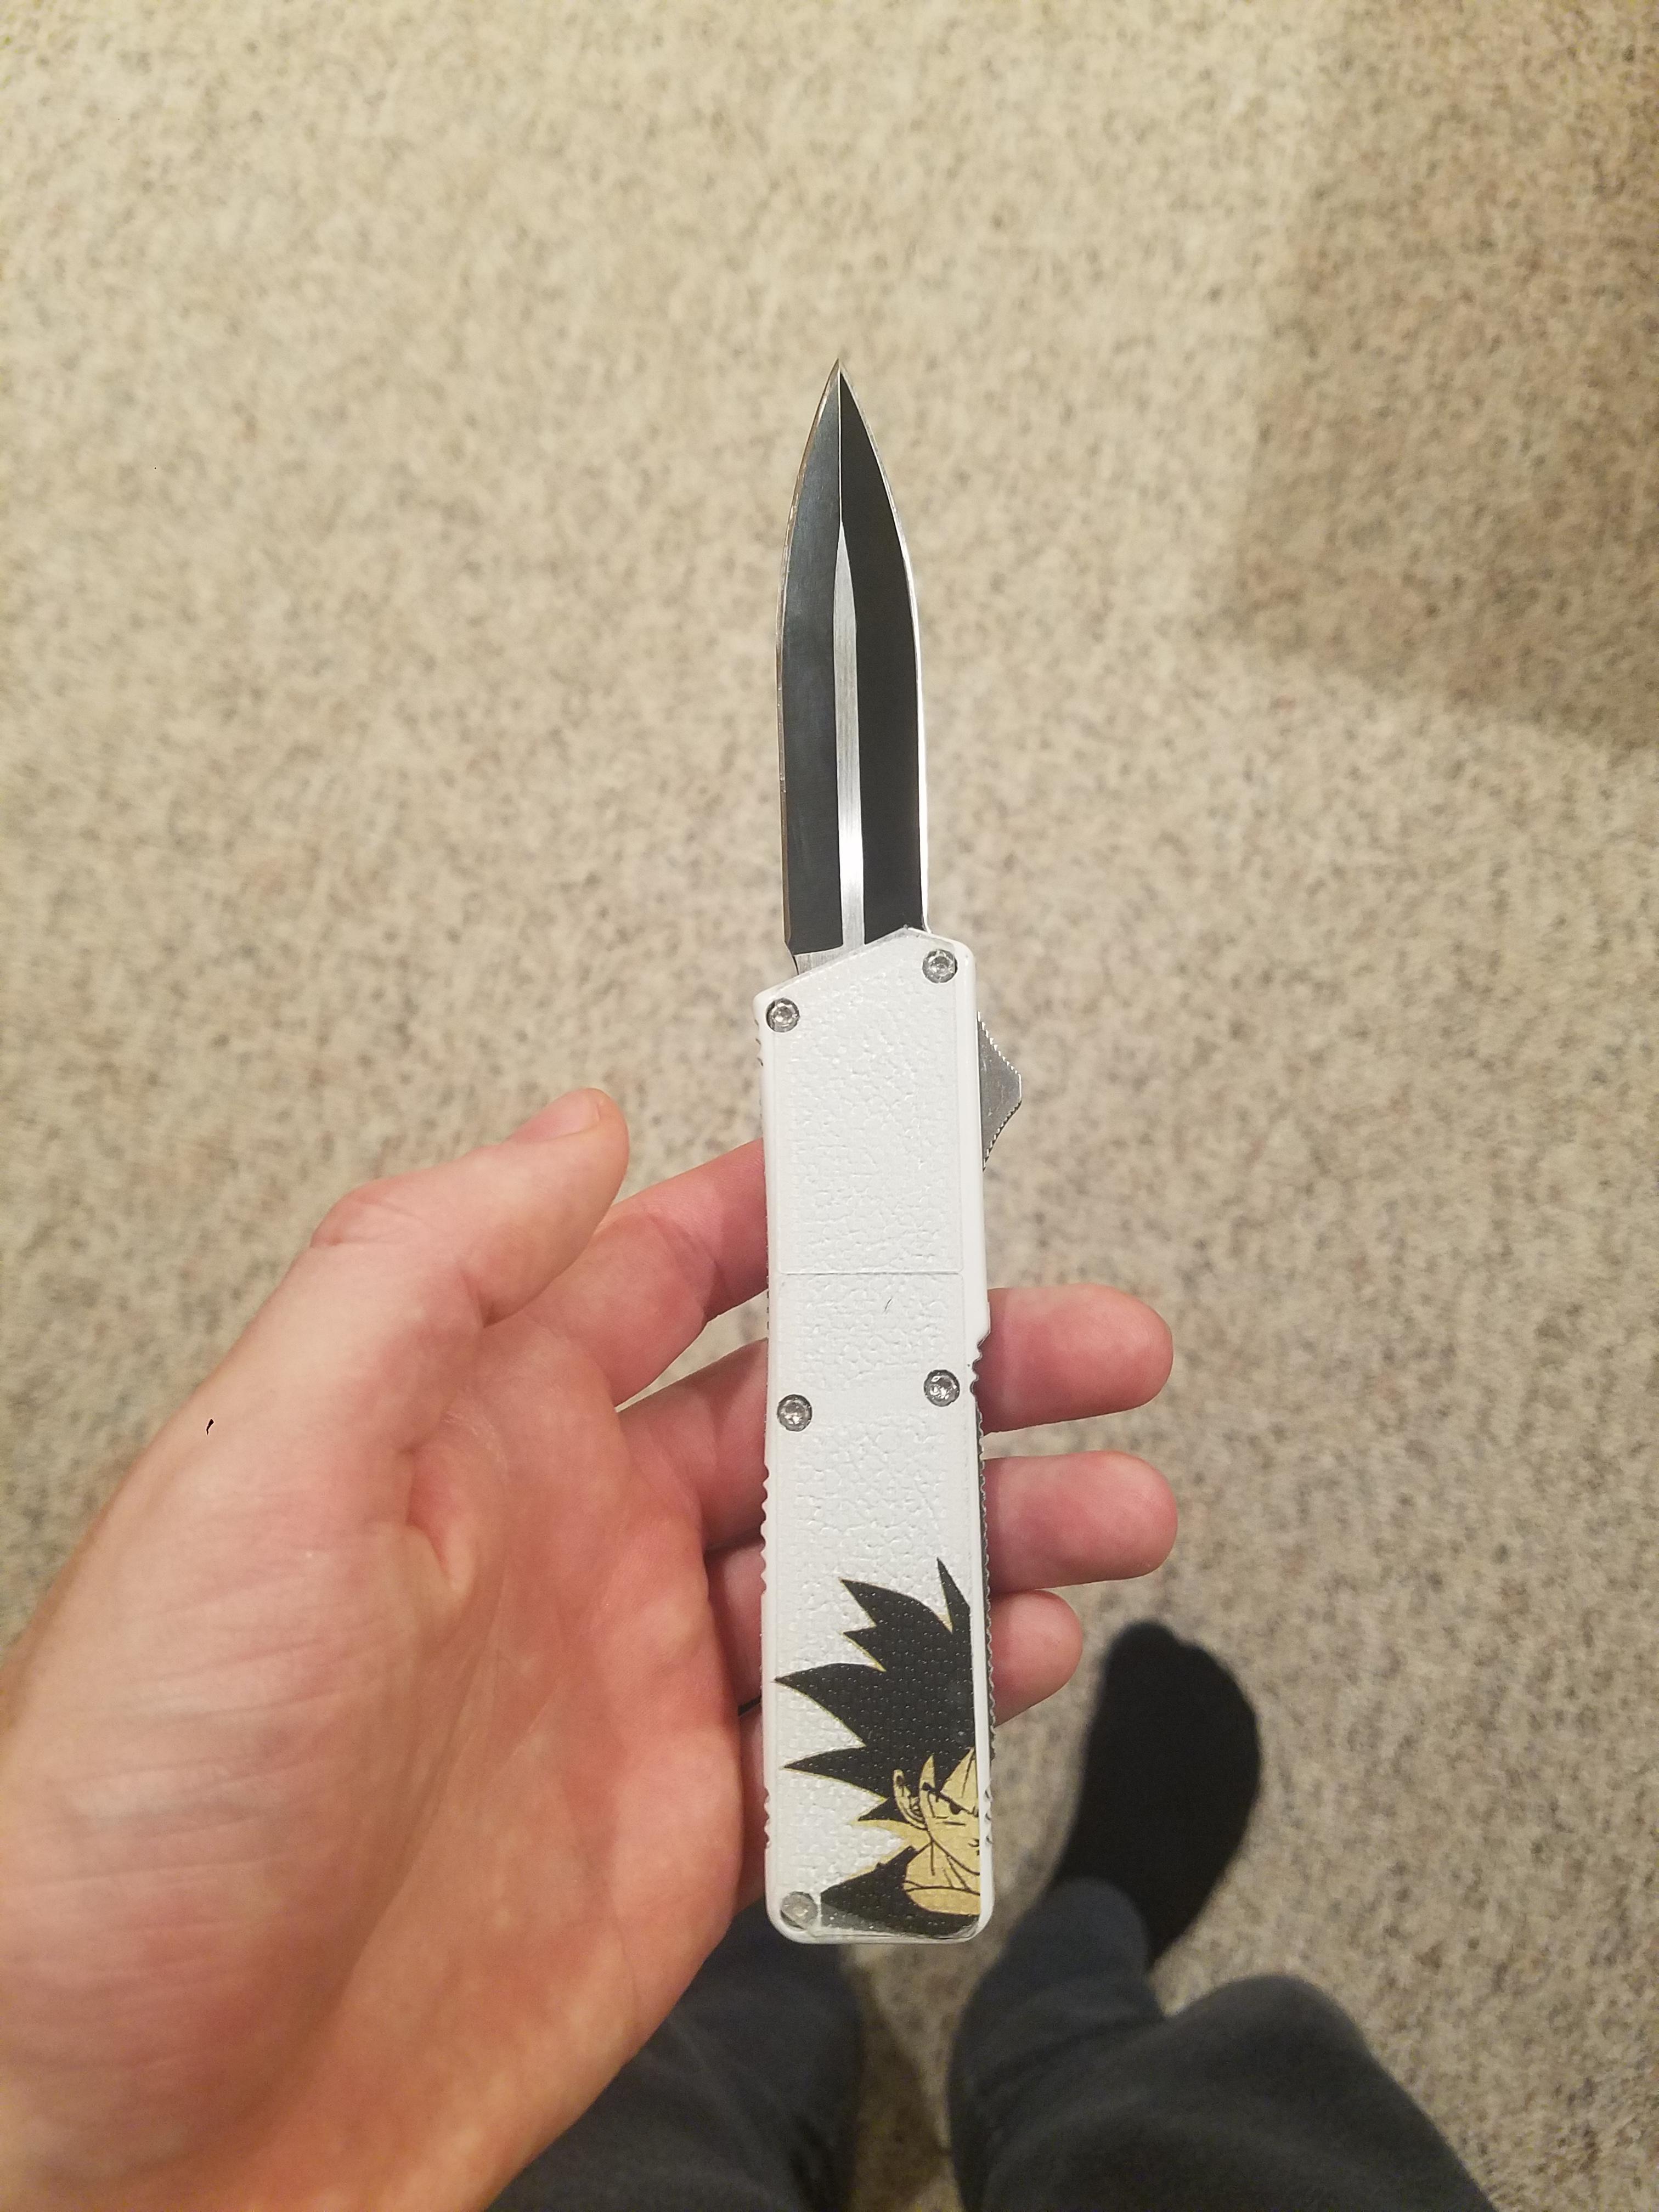 dbz lightning otf knives